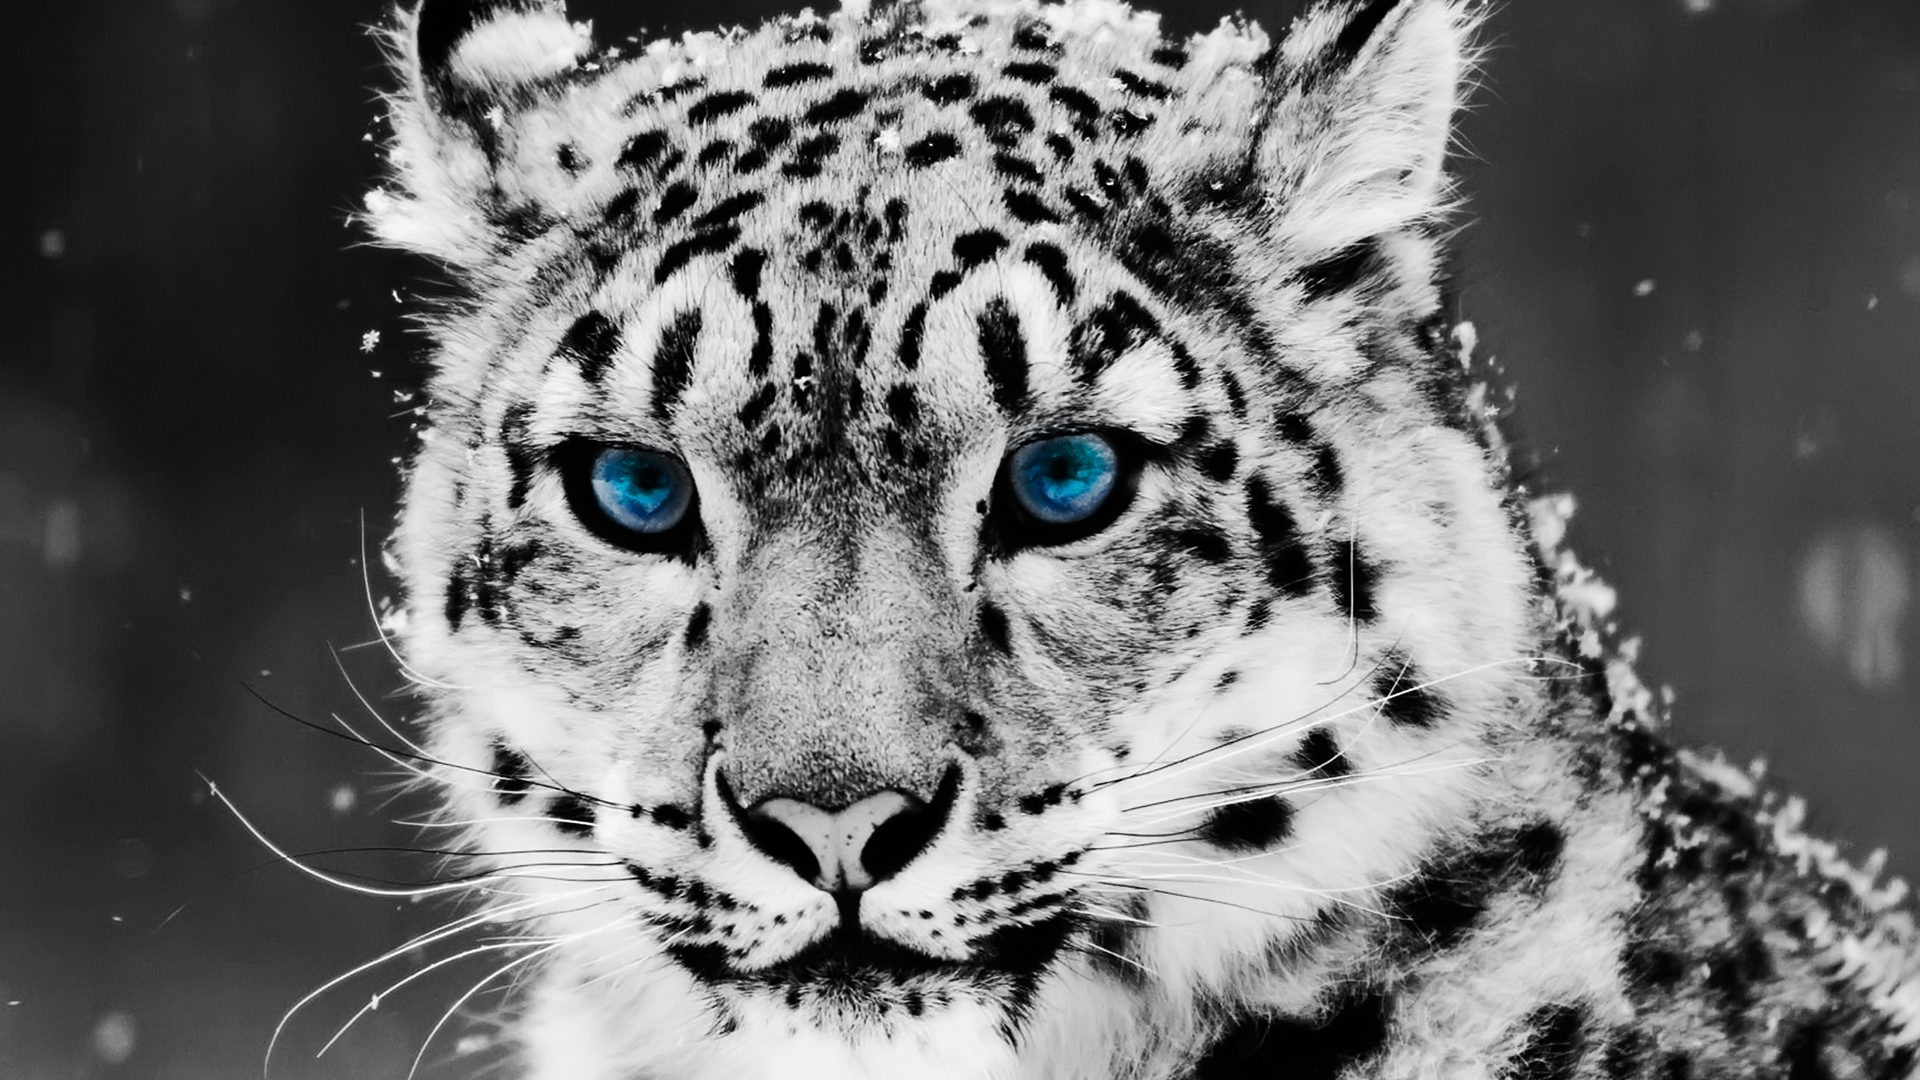 49] Backgrounds Animals on WallpaperSafari 1920x1080